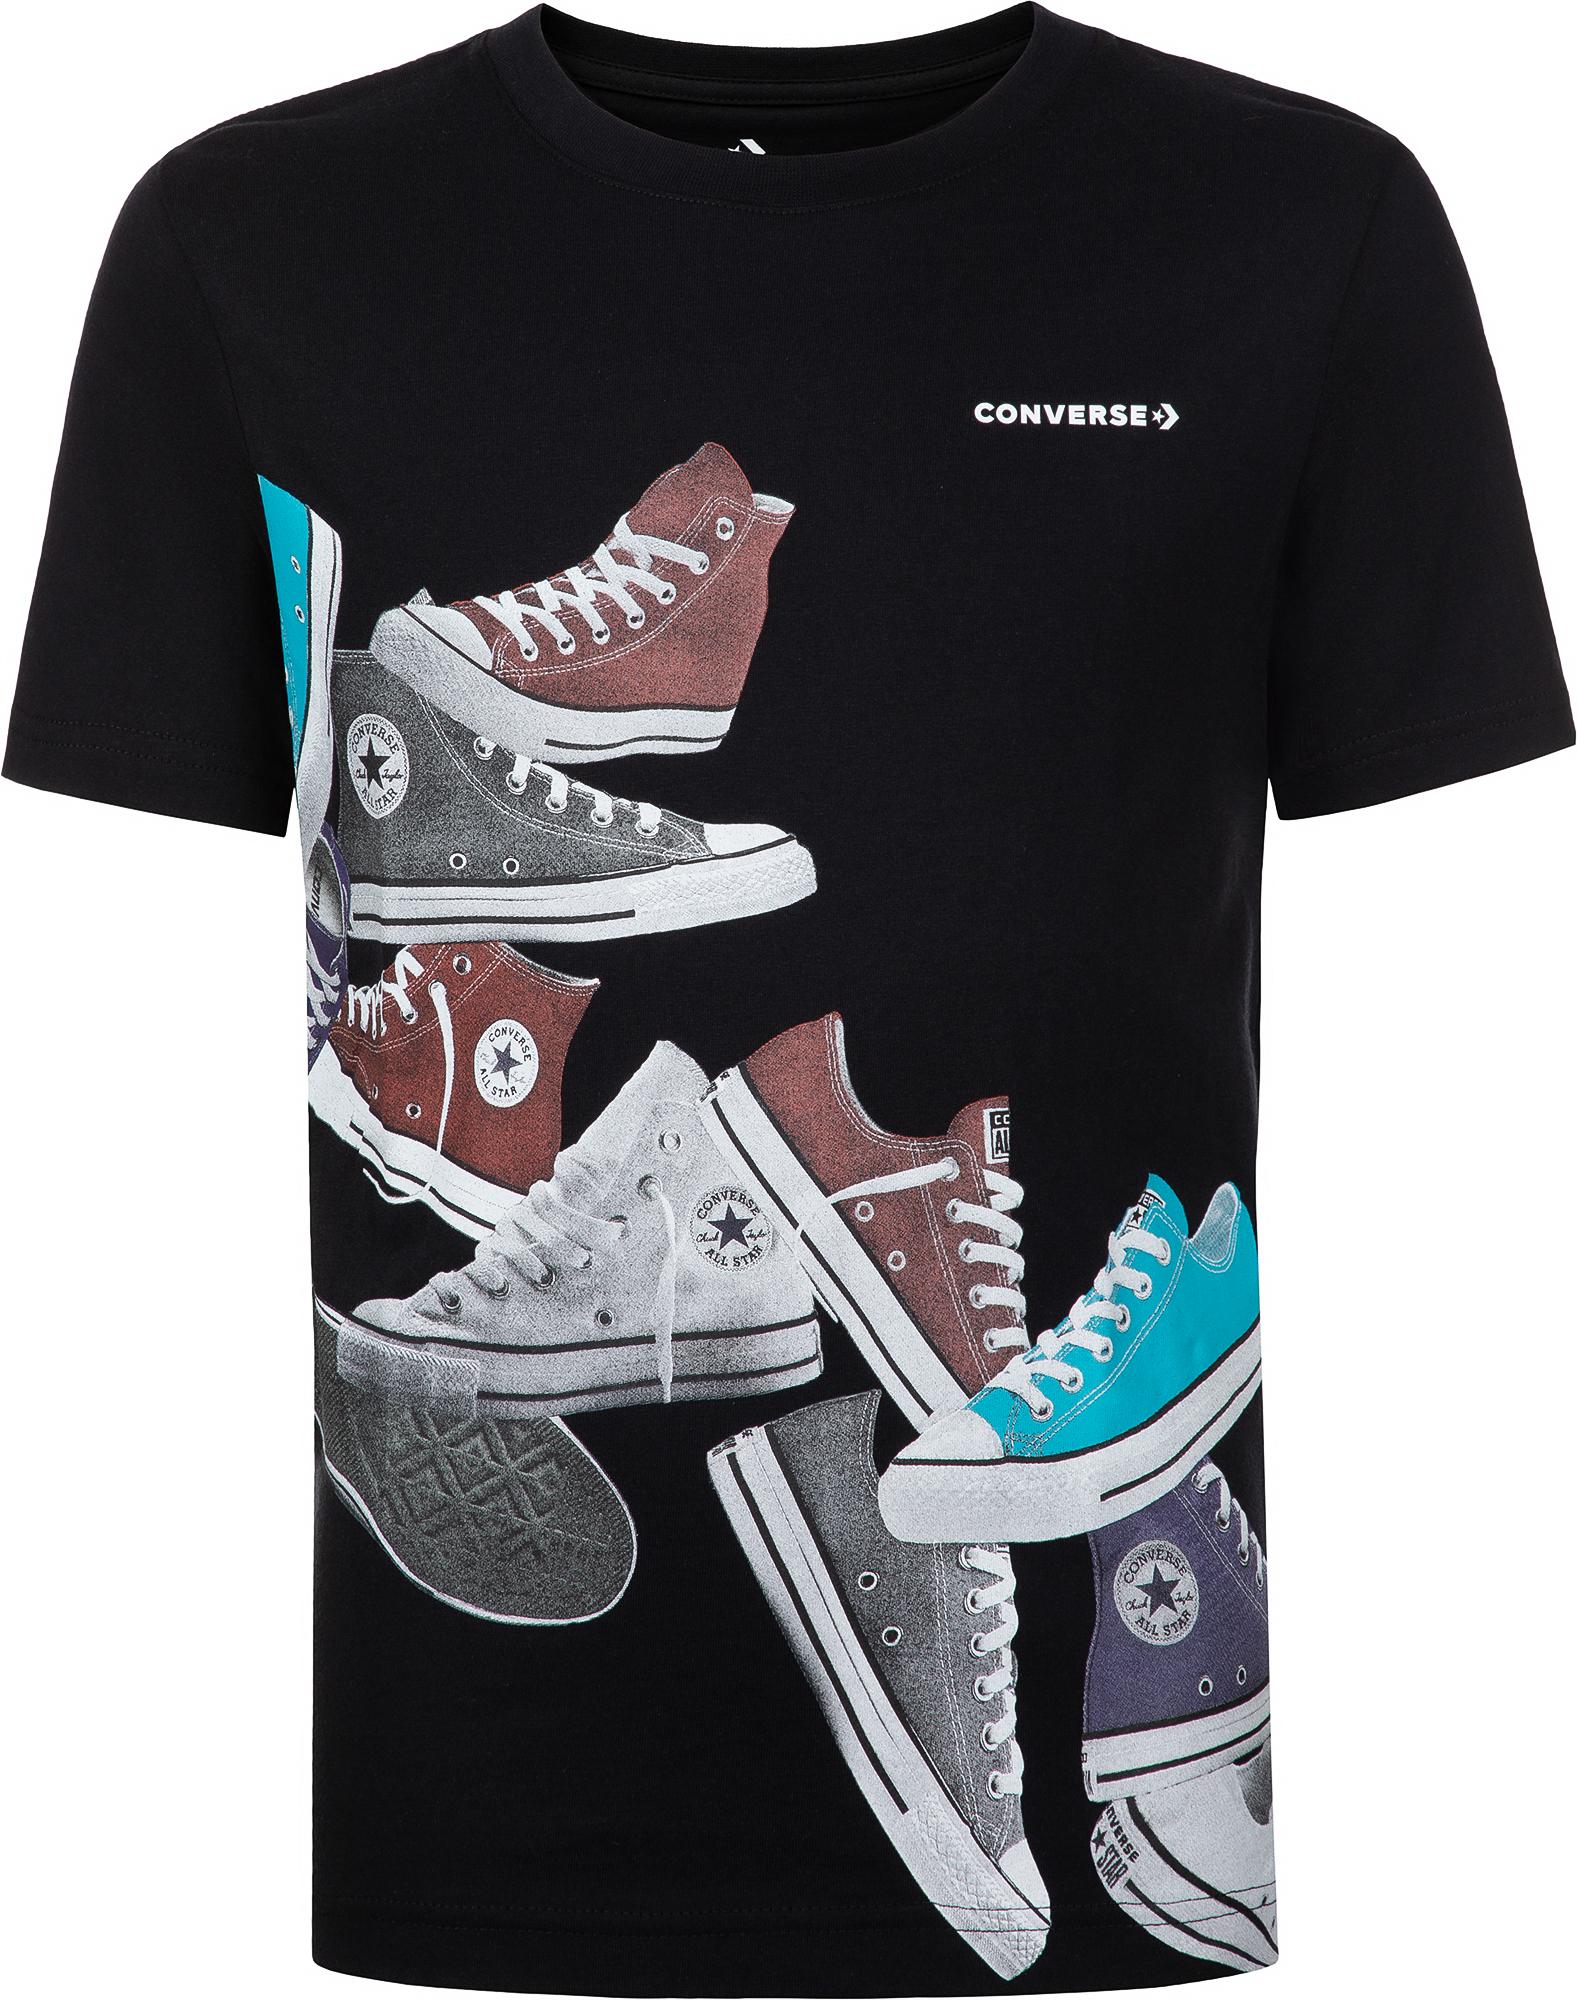 Фото - Converse Футболка для мальчиков Converse Ascending sneakers, размер 128 футболка converse tilted star chevron tee